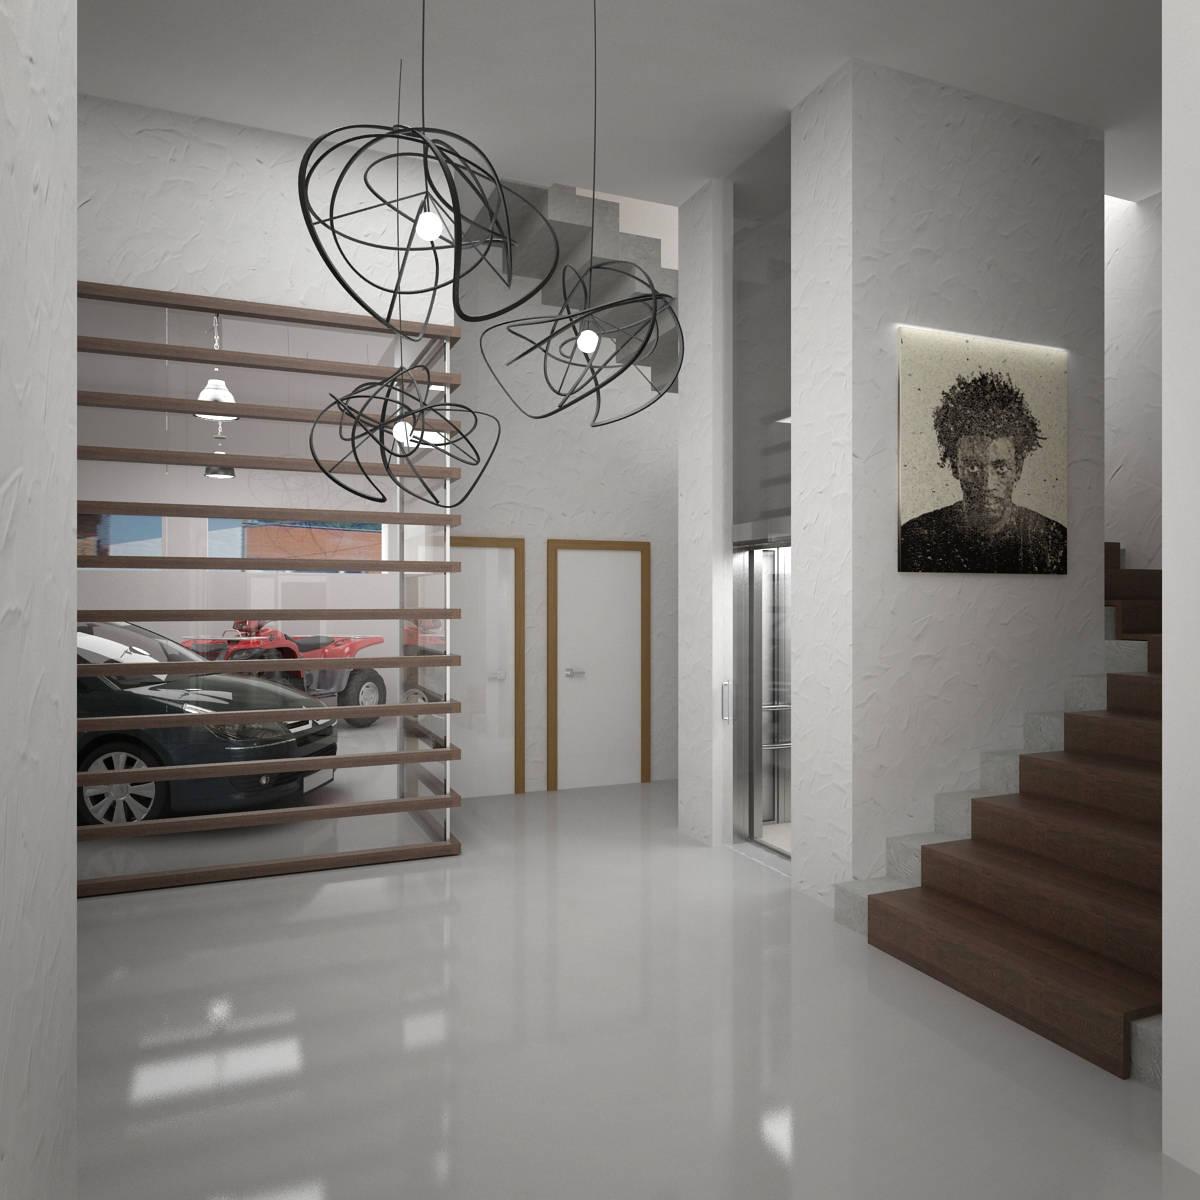 интерьер трехэтажного таунхауса